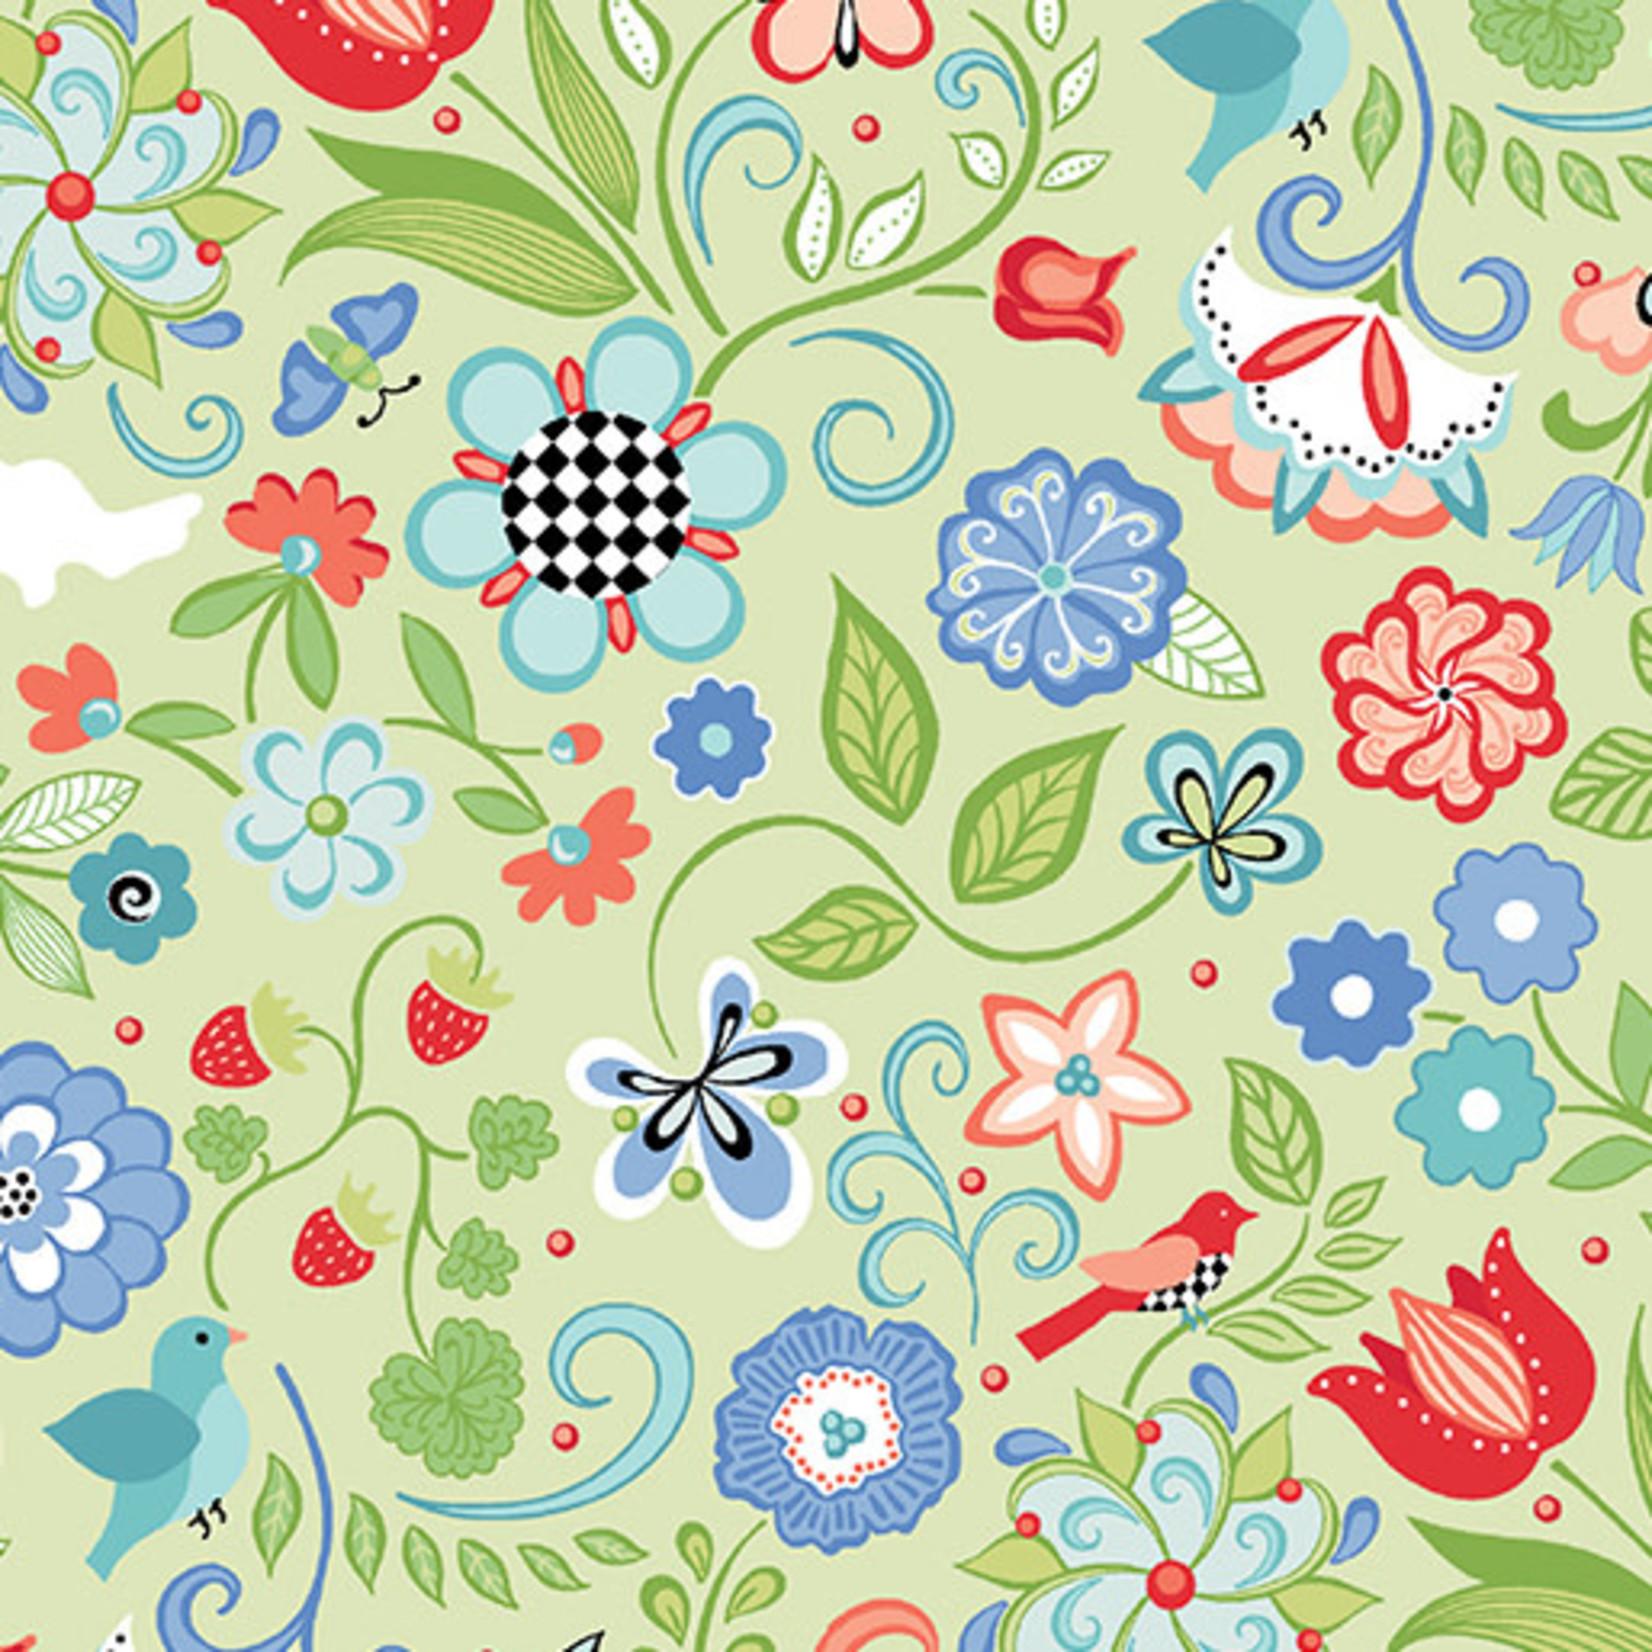 Contempo Studio Folk Art Fantasy - Floral - Light Green